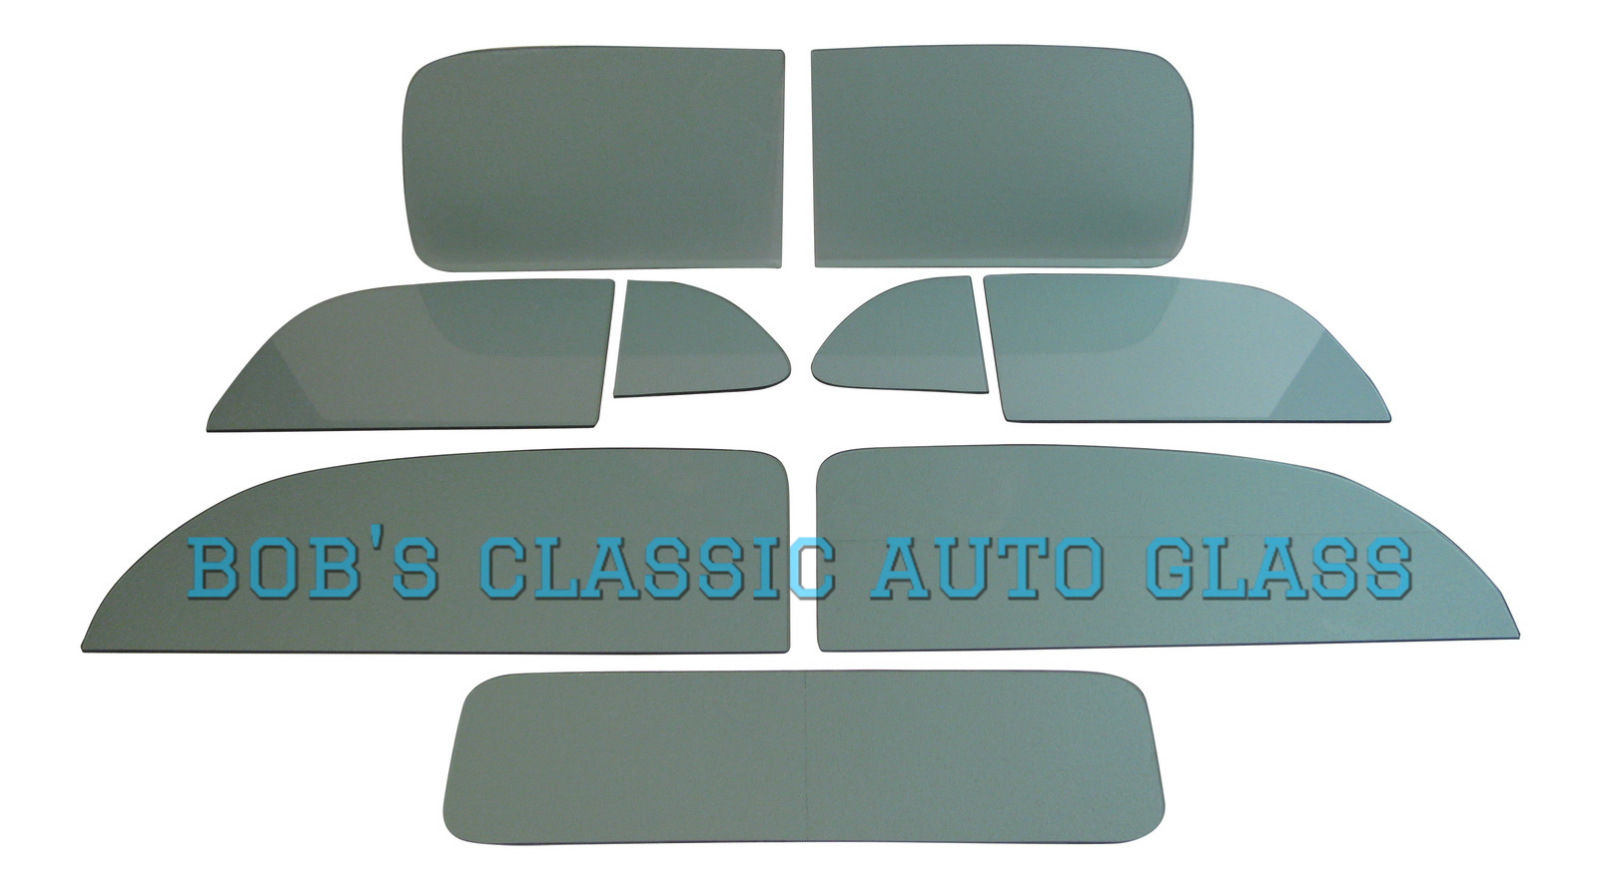 1939 CHEVROLET 2 DOOR SEDAN CLASSIC AUTO GLASS VIN